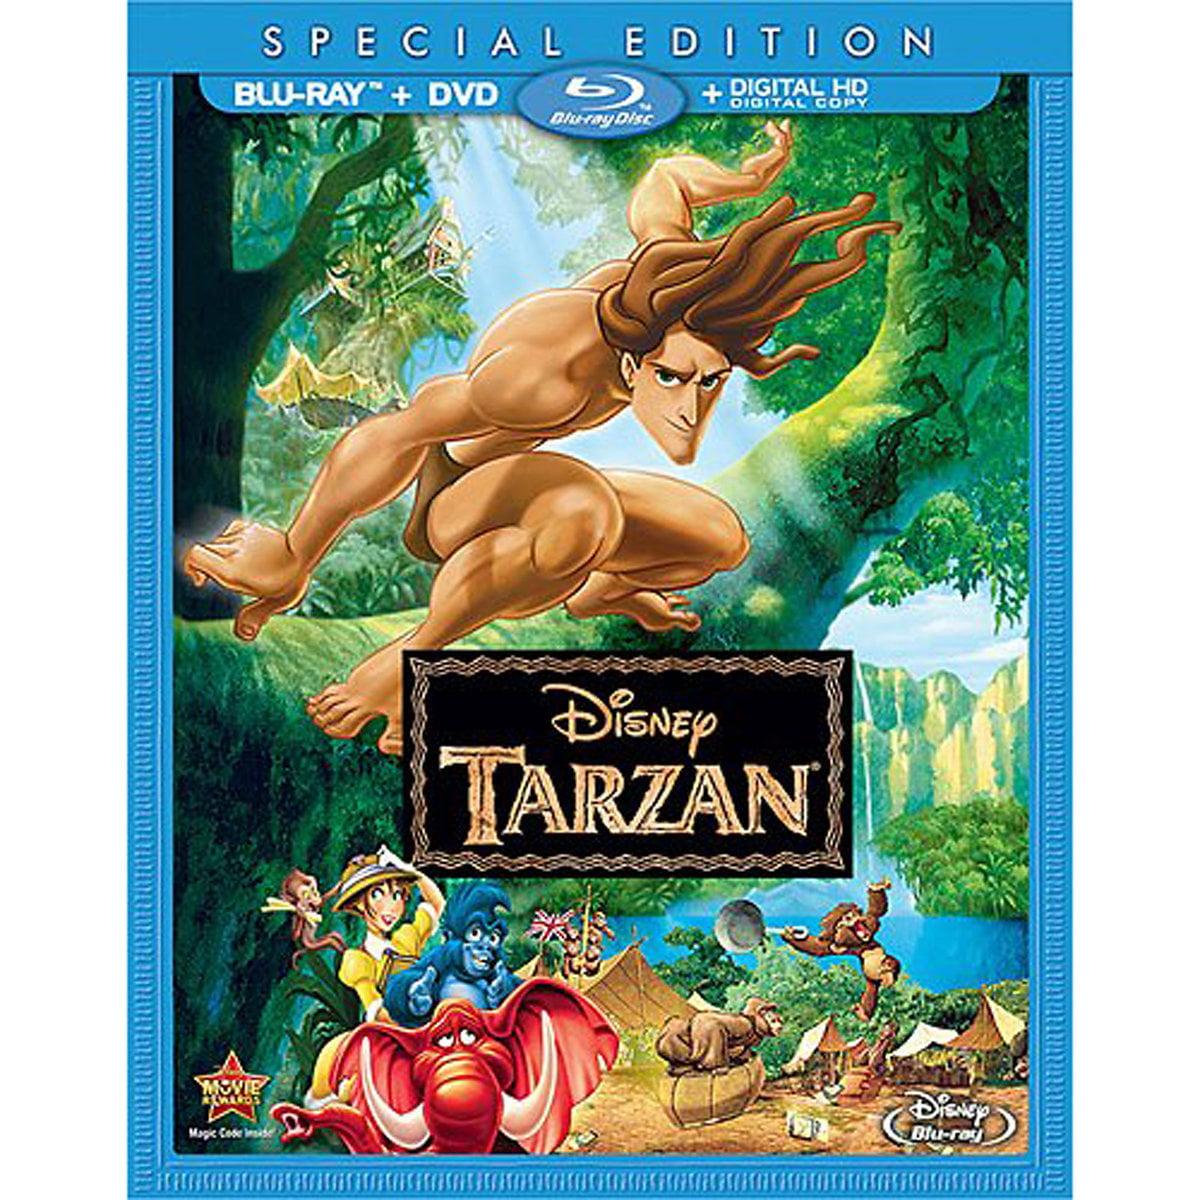 Tarzan (Special Edition) (Blu-ray + DVD + Digital HD)